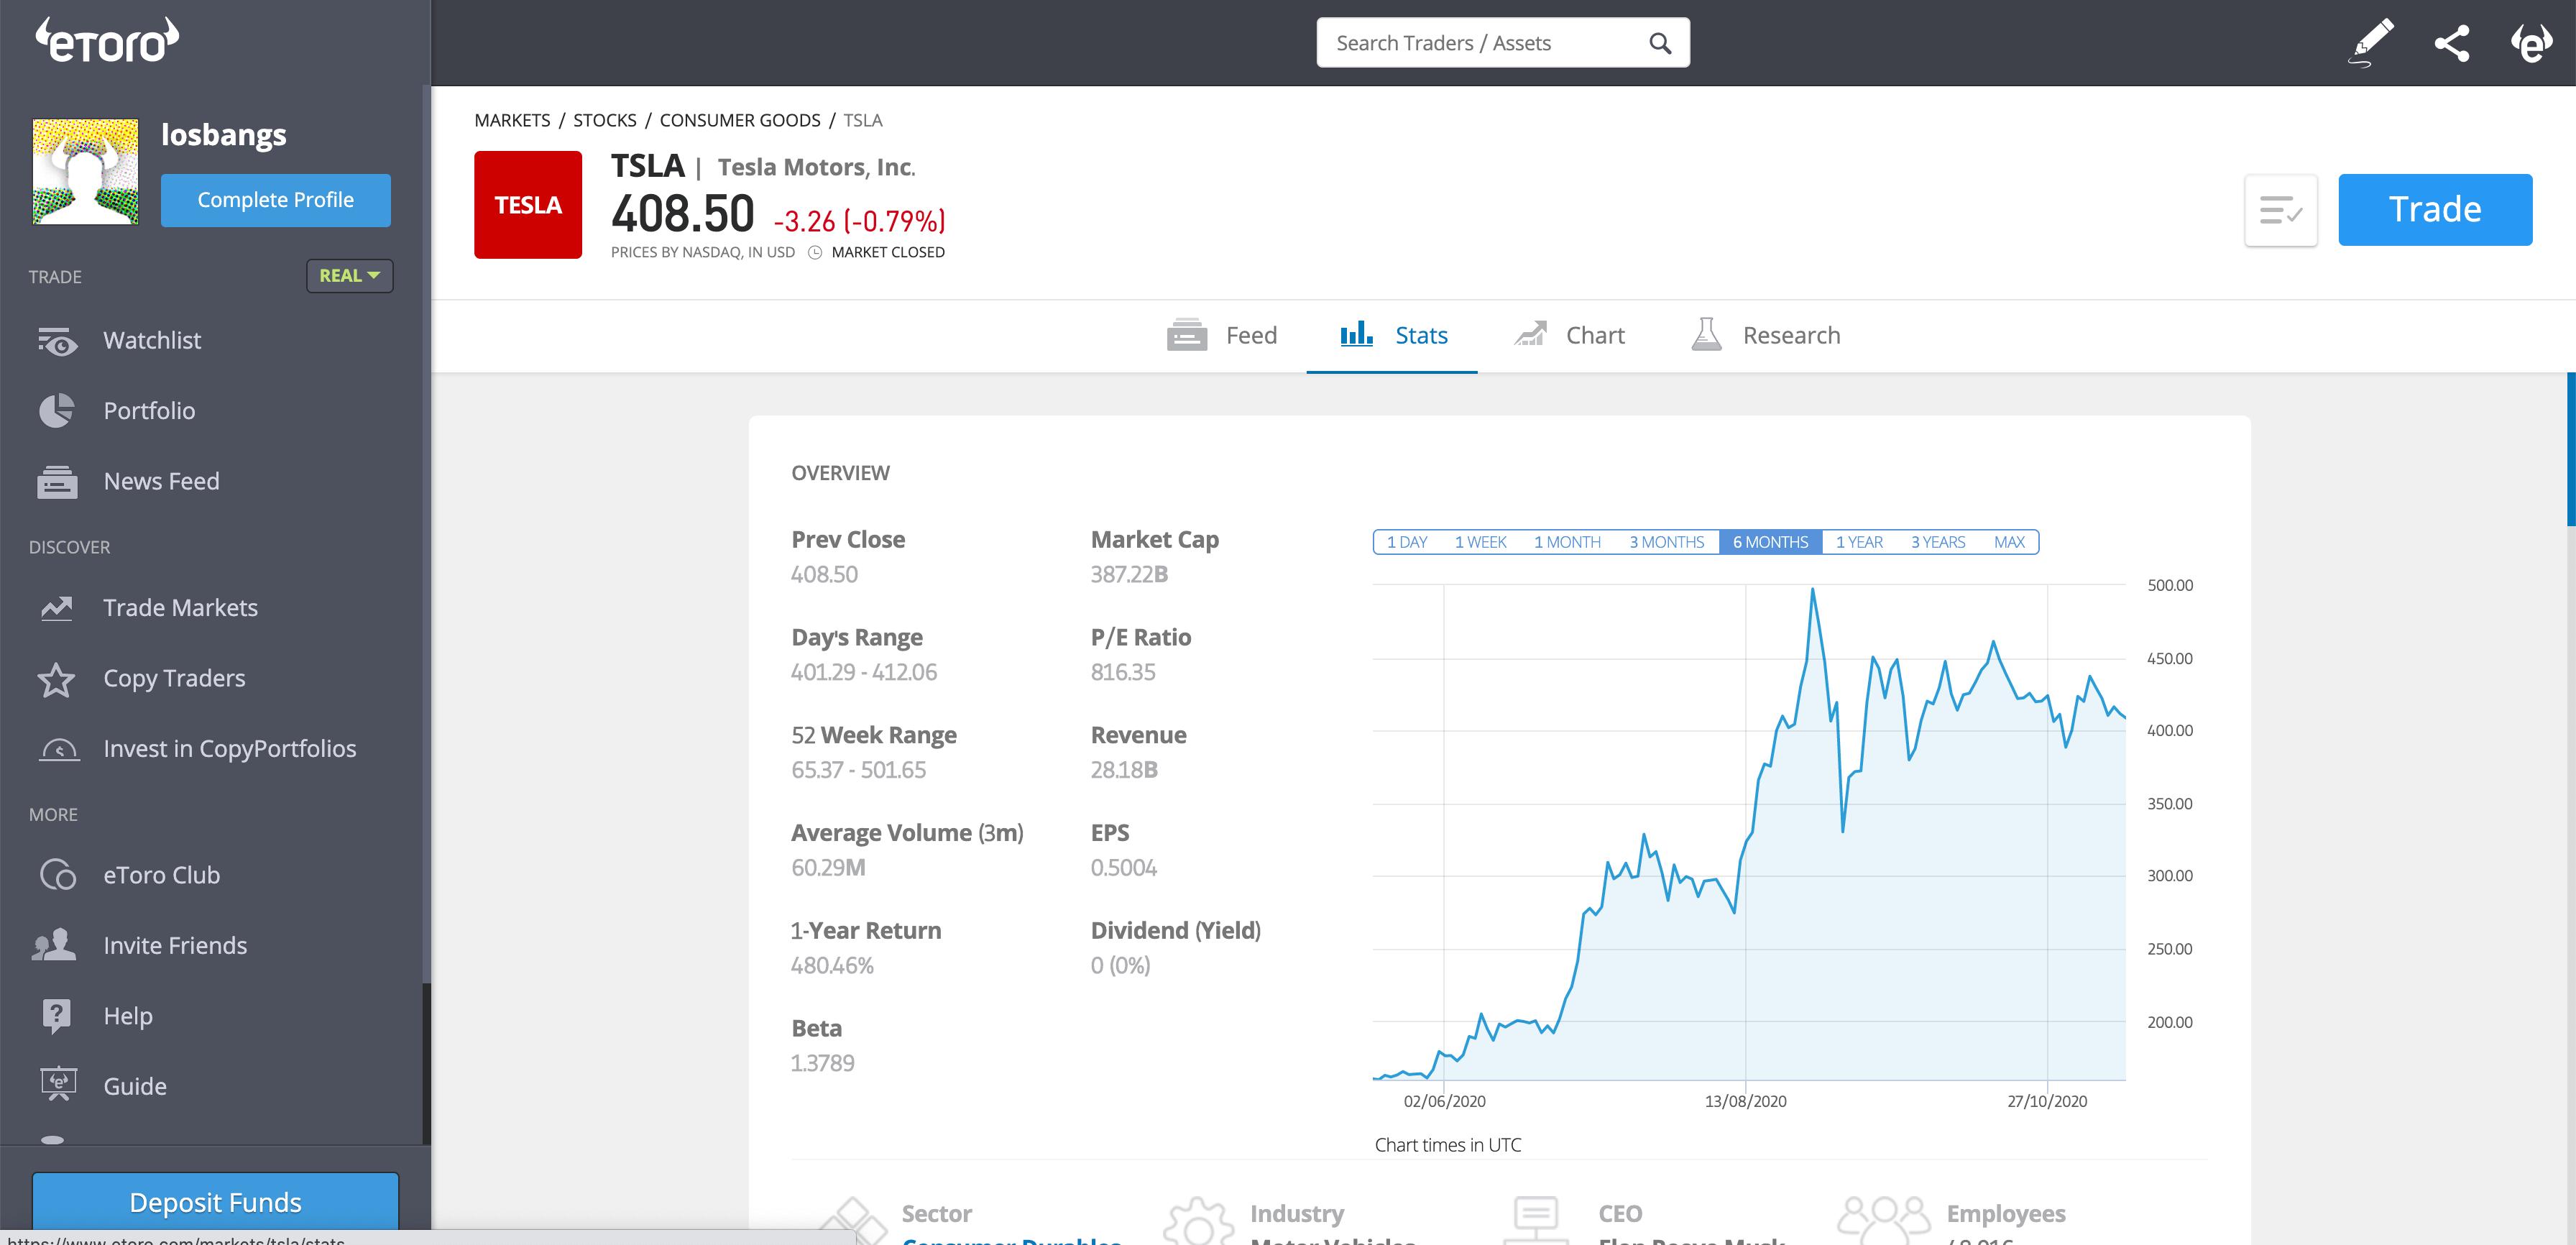 etoro Trading Offers Assets